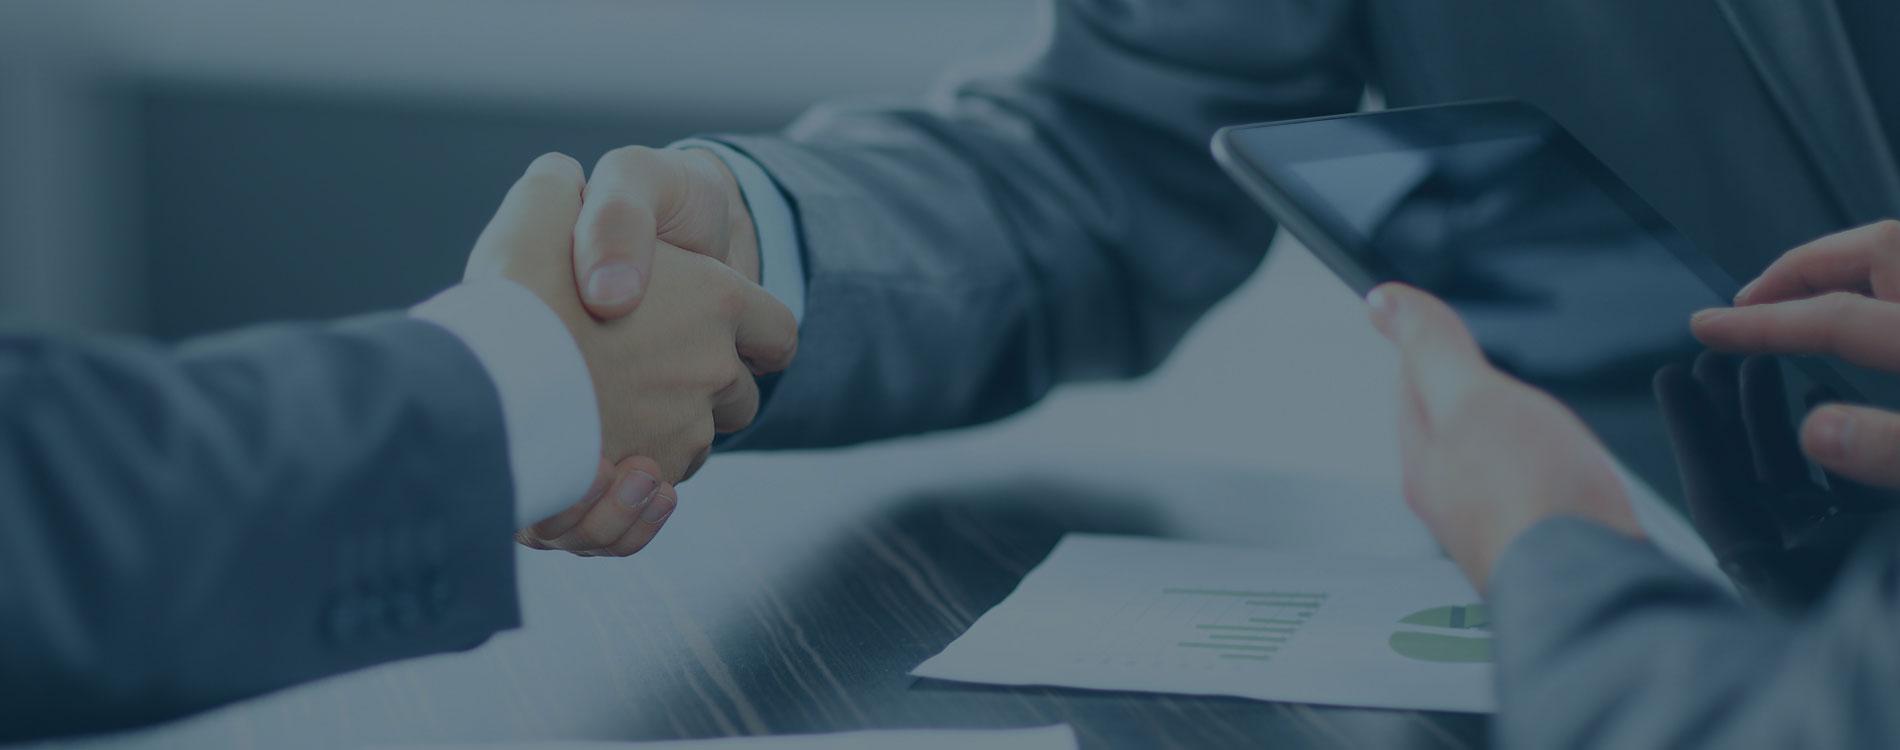 slider fondo servicios asesoría mercantil en Villarreal